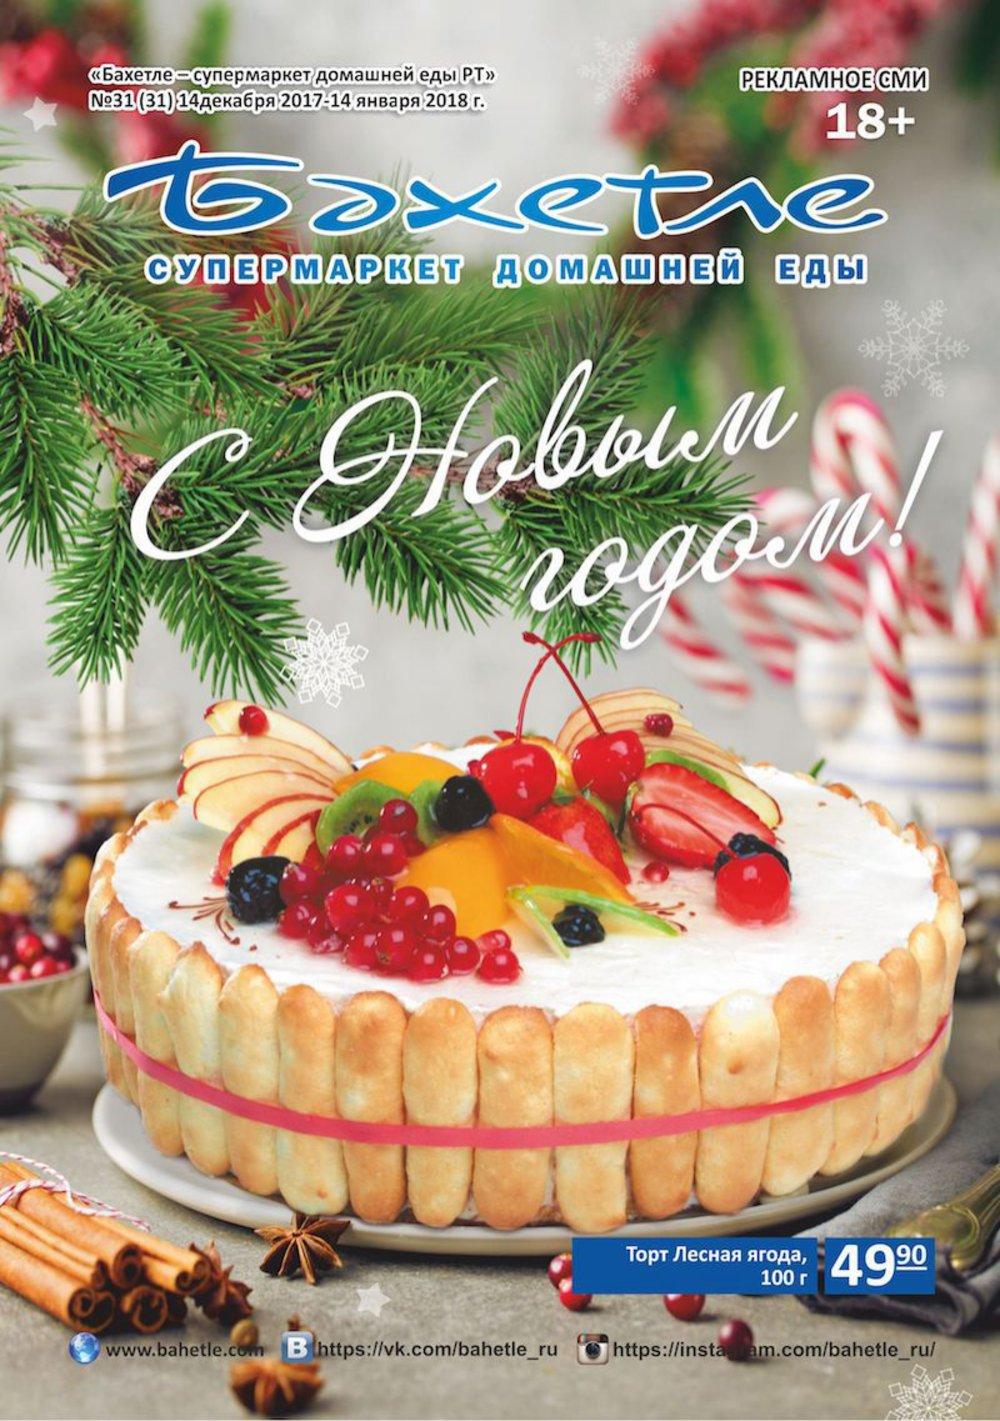 Каталог акций Бахетле с 14 декабря 2017 по 14 января 2018 - стр. 1